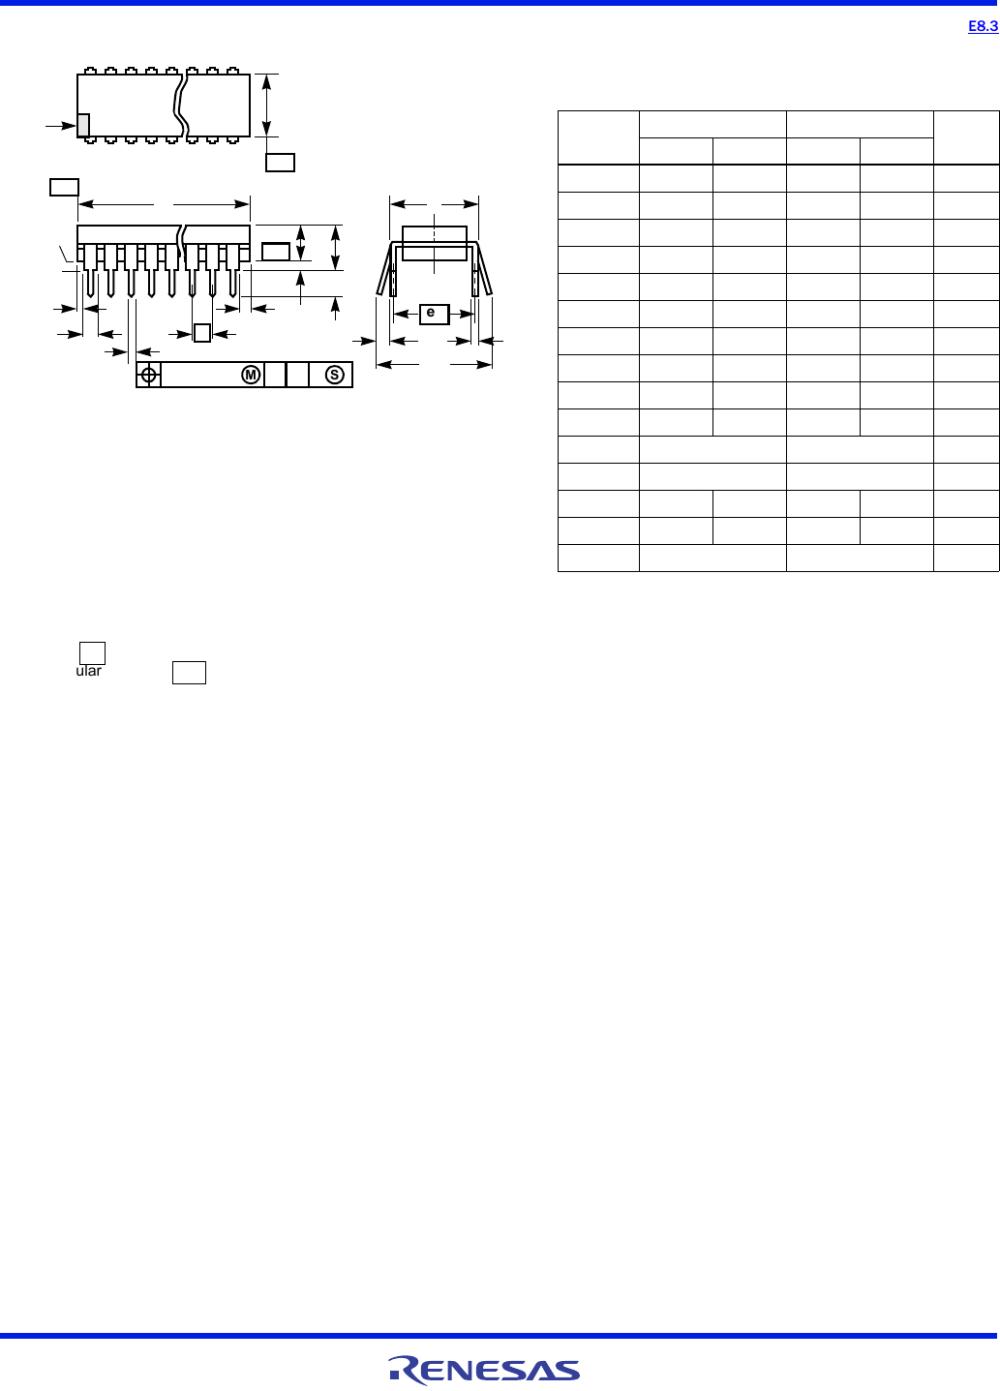 medium resolution of isl83483 isl83485 isl83488 isl83490 isl83491